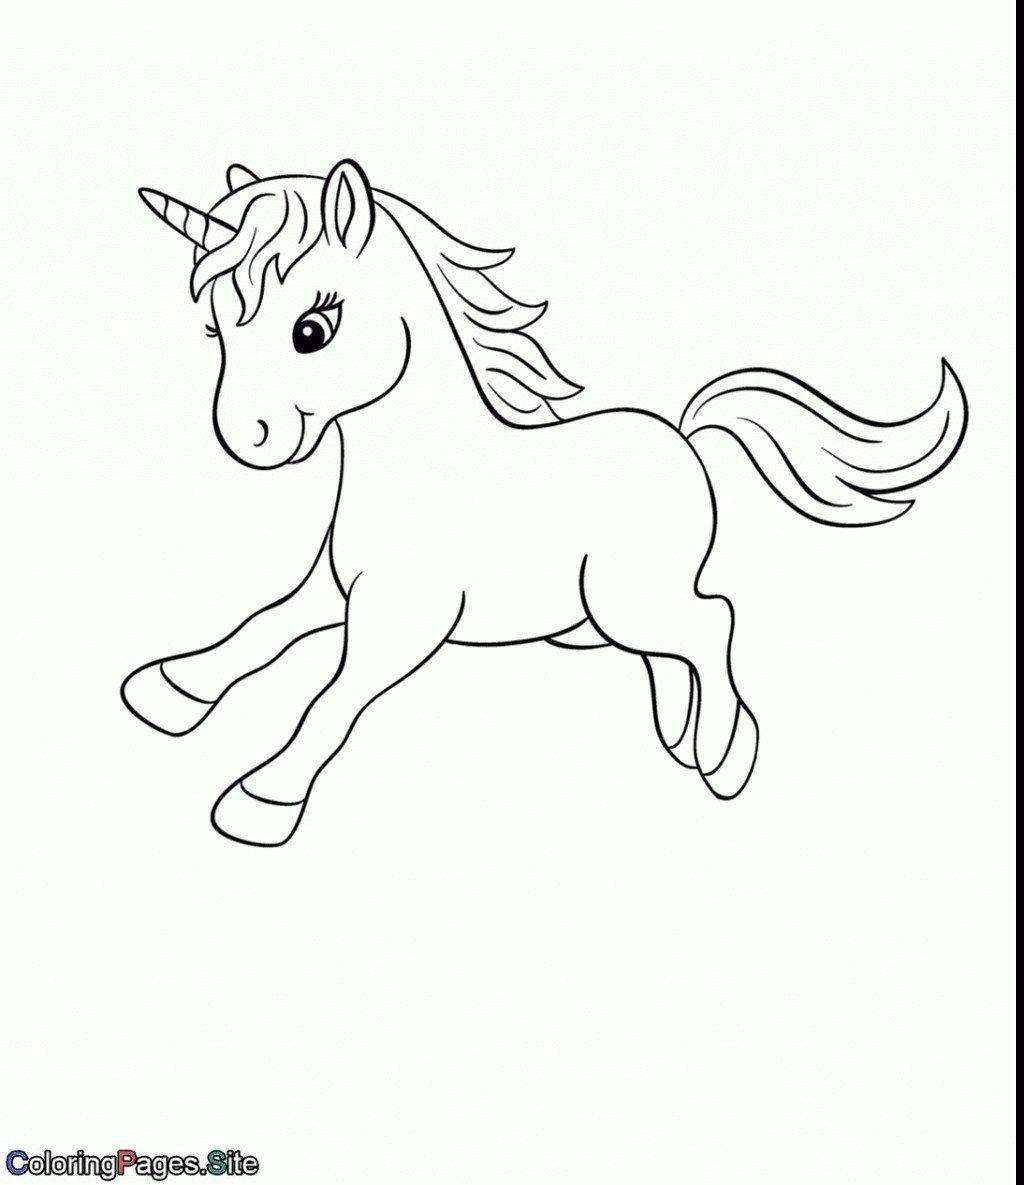 Unicorn Coloring Pages Printable Fresh Coloring Pages Printable Unicorn Coloring Pages Games With Unicorn Coloring Pages Cute Coloring Pages Baby Unicorn